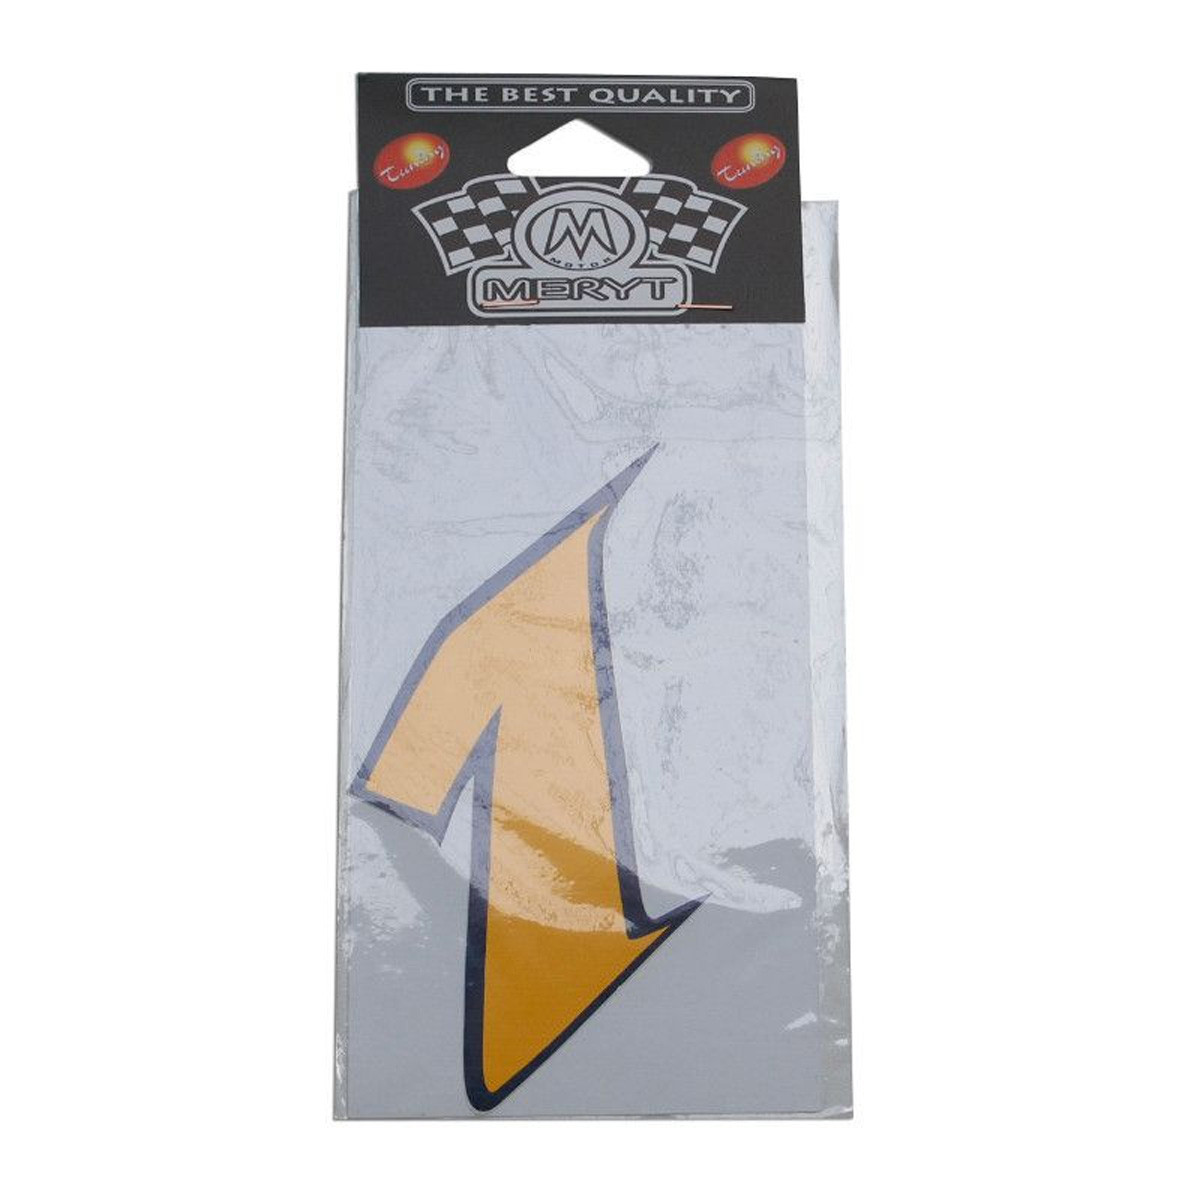 Autocollant / Sticker - MERYT Numéro 1 Jaune 9cm